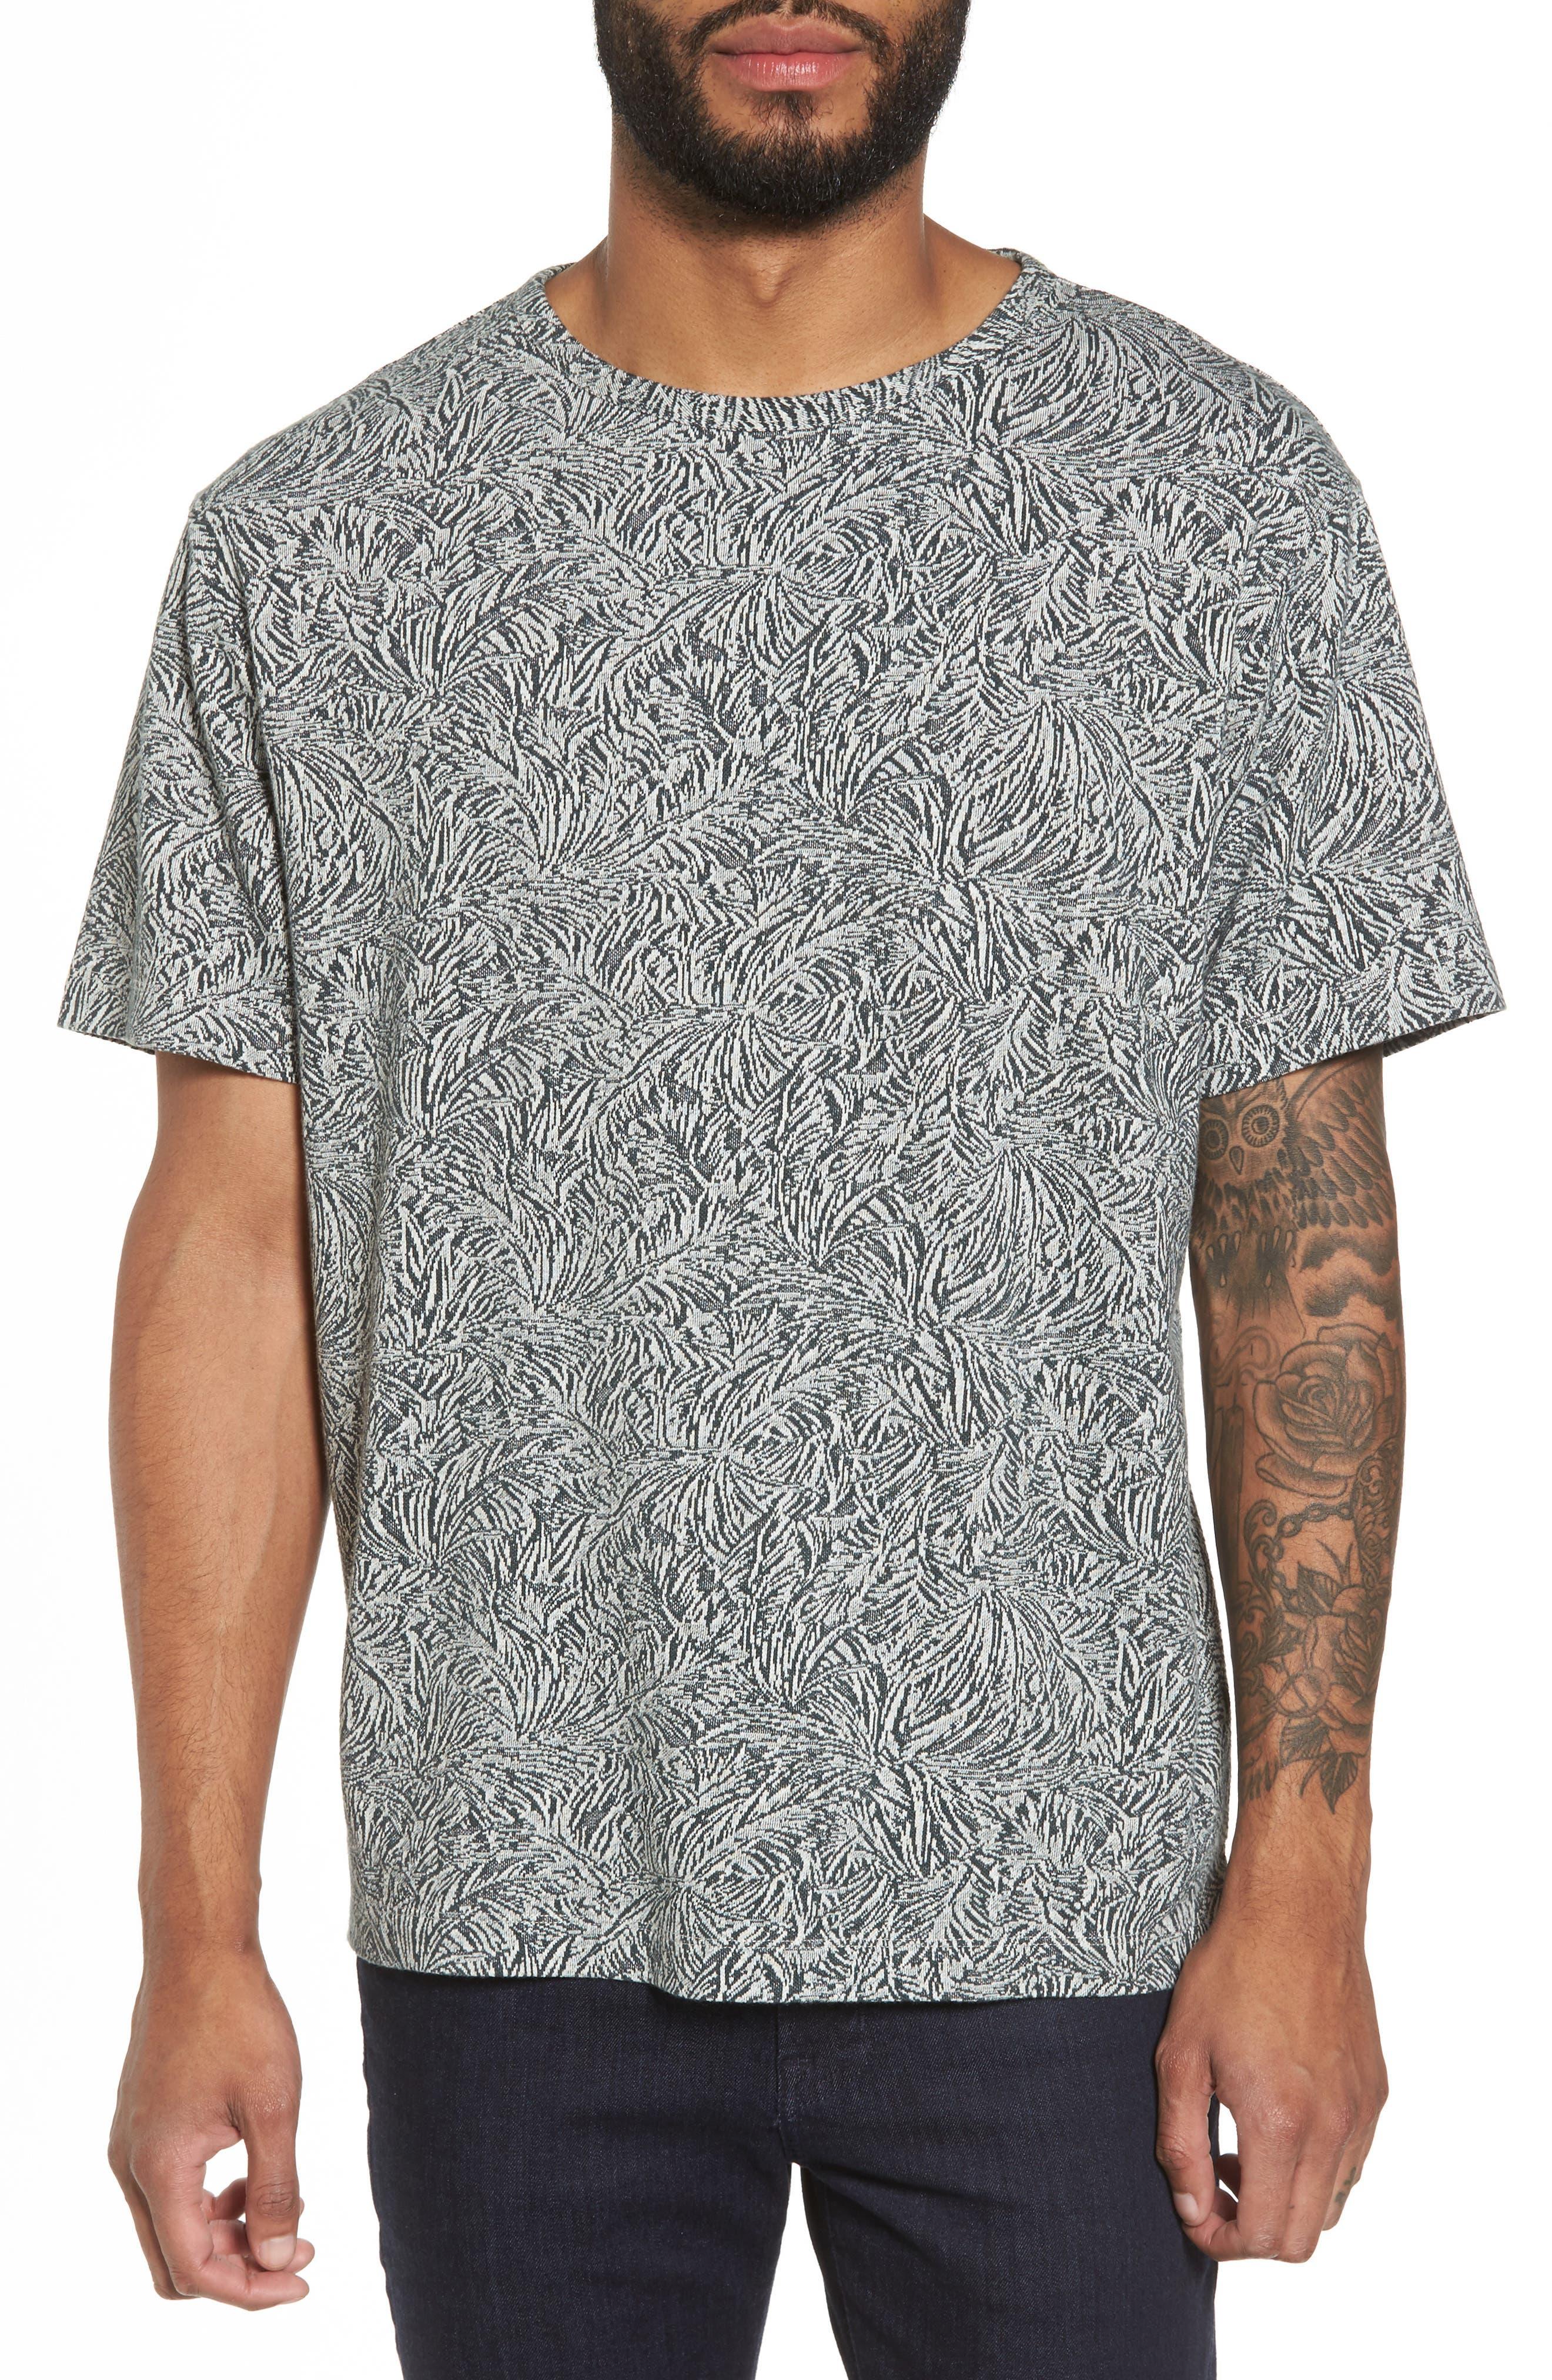 Palm Jacquard Crewneck T-Shirt,                             Main thumbnail 1, color,                             177